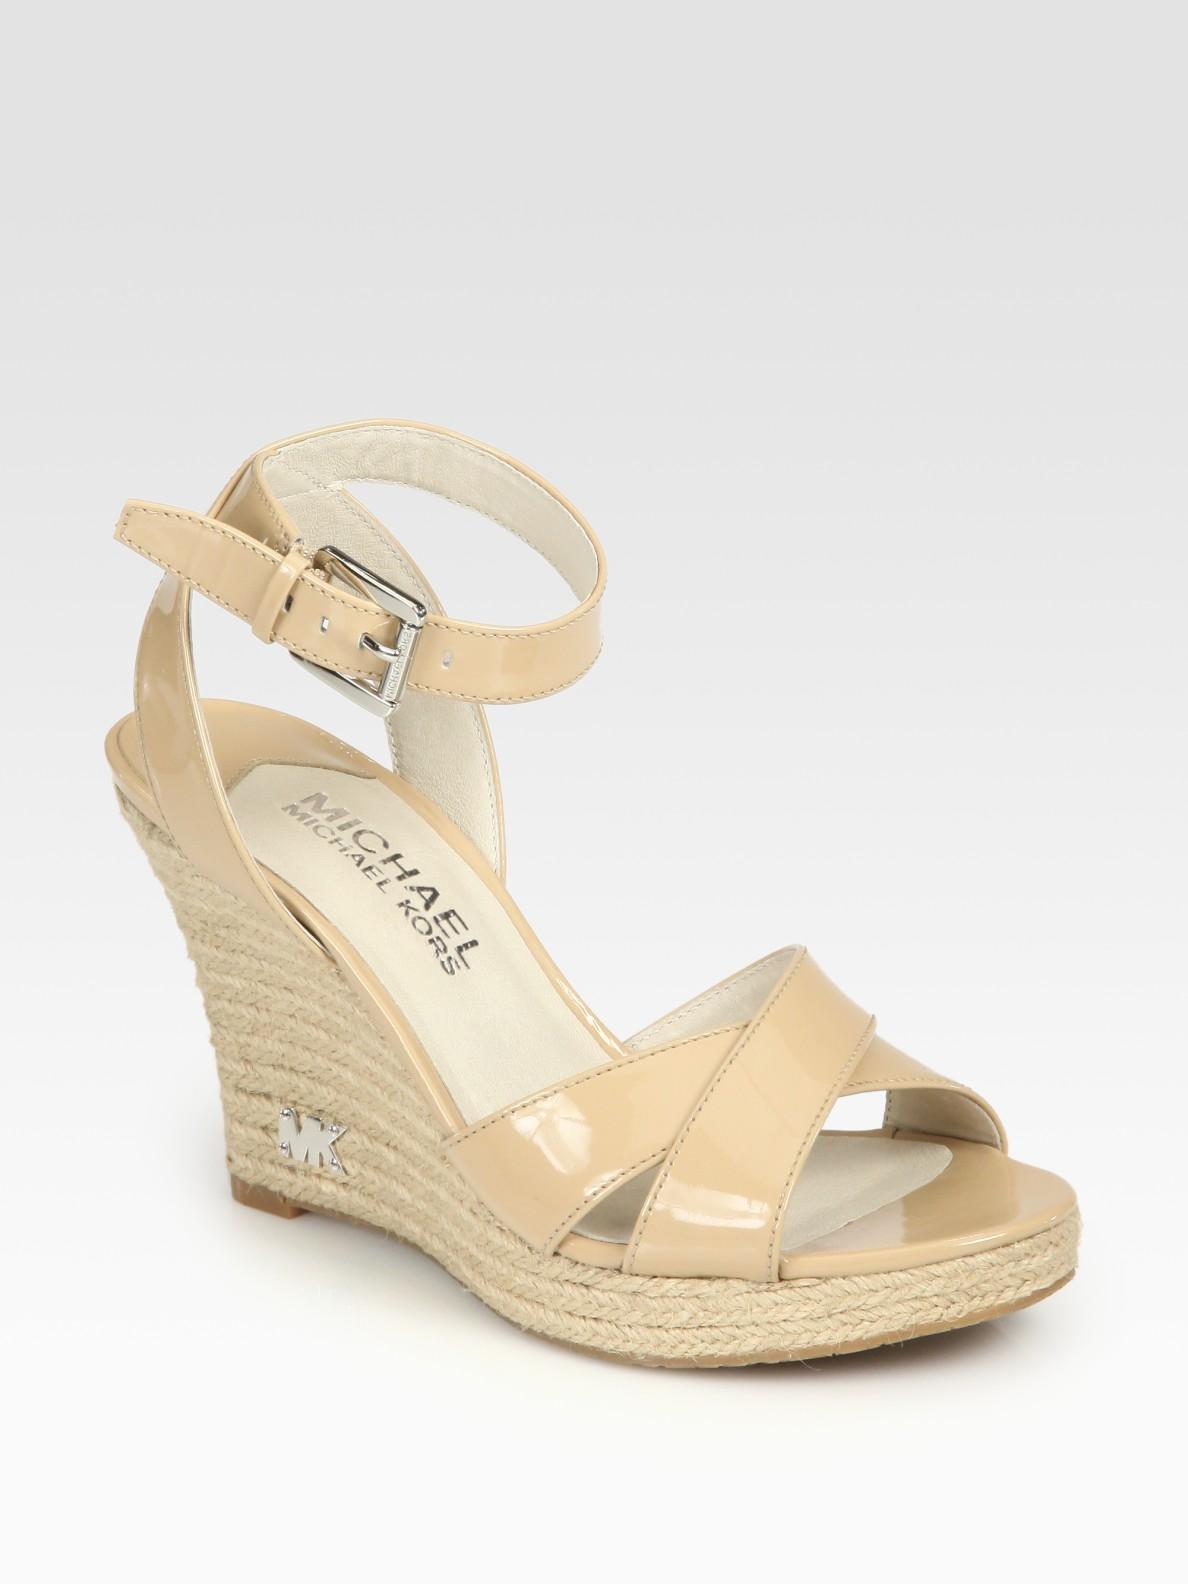 9c72a3c4a6f MICHAEL Michael Kors Natural Kami Patent Leather Espadrille Wedge Sandals